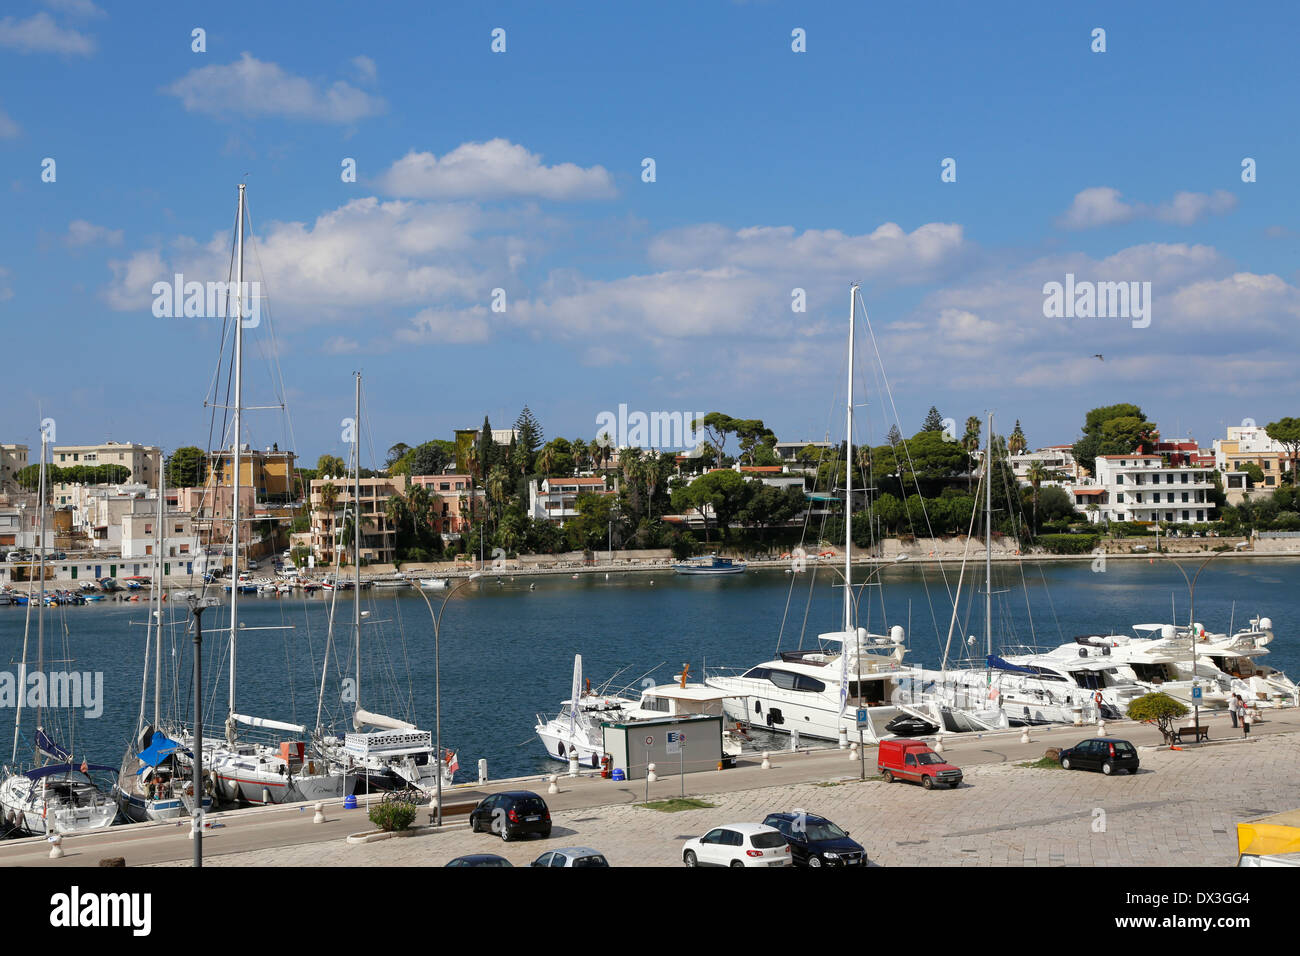 Mirando a través del Seno di Ponente en Brindisi, Puglia, Italia Imagen De Stock